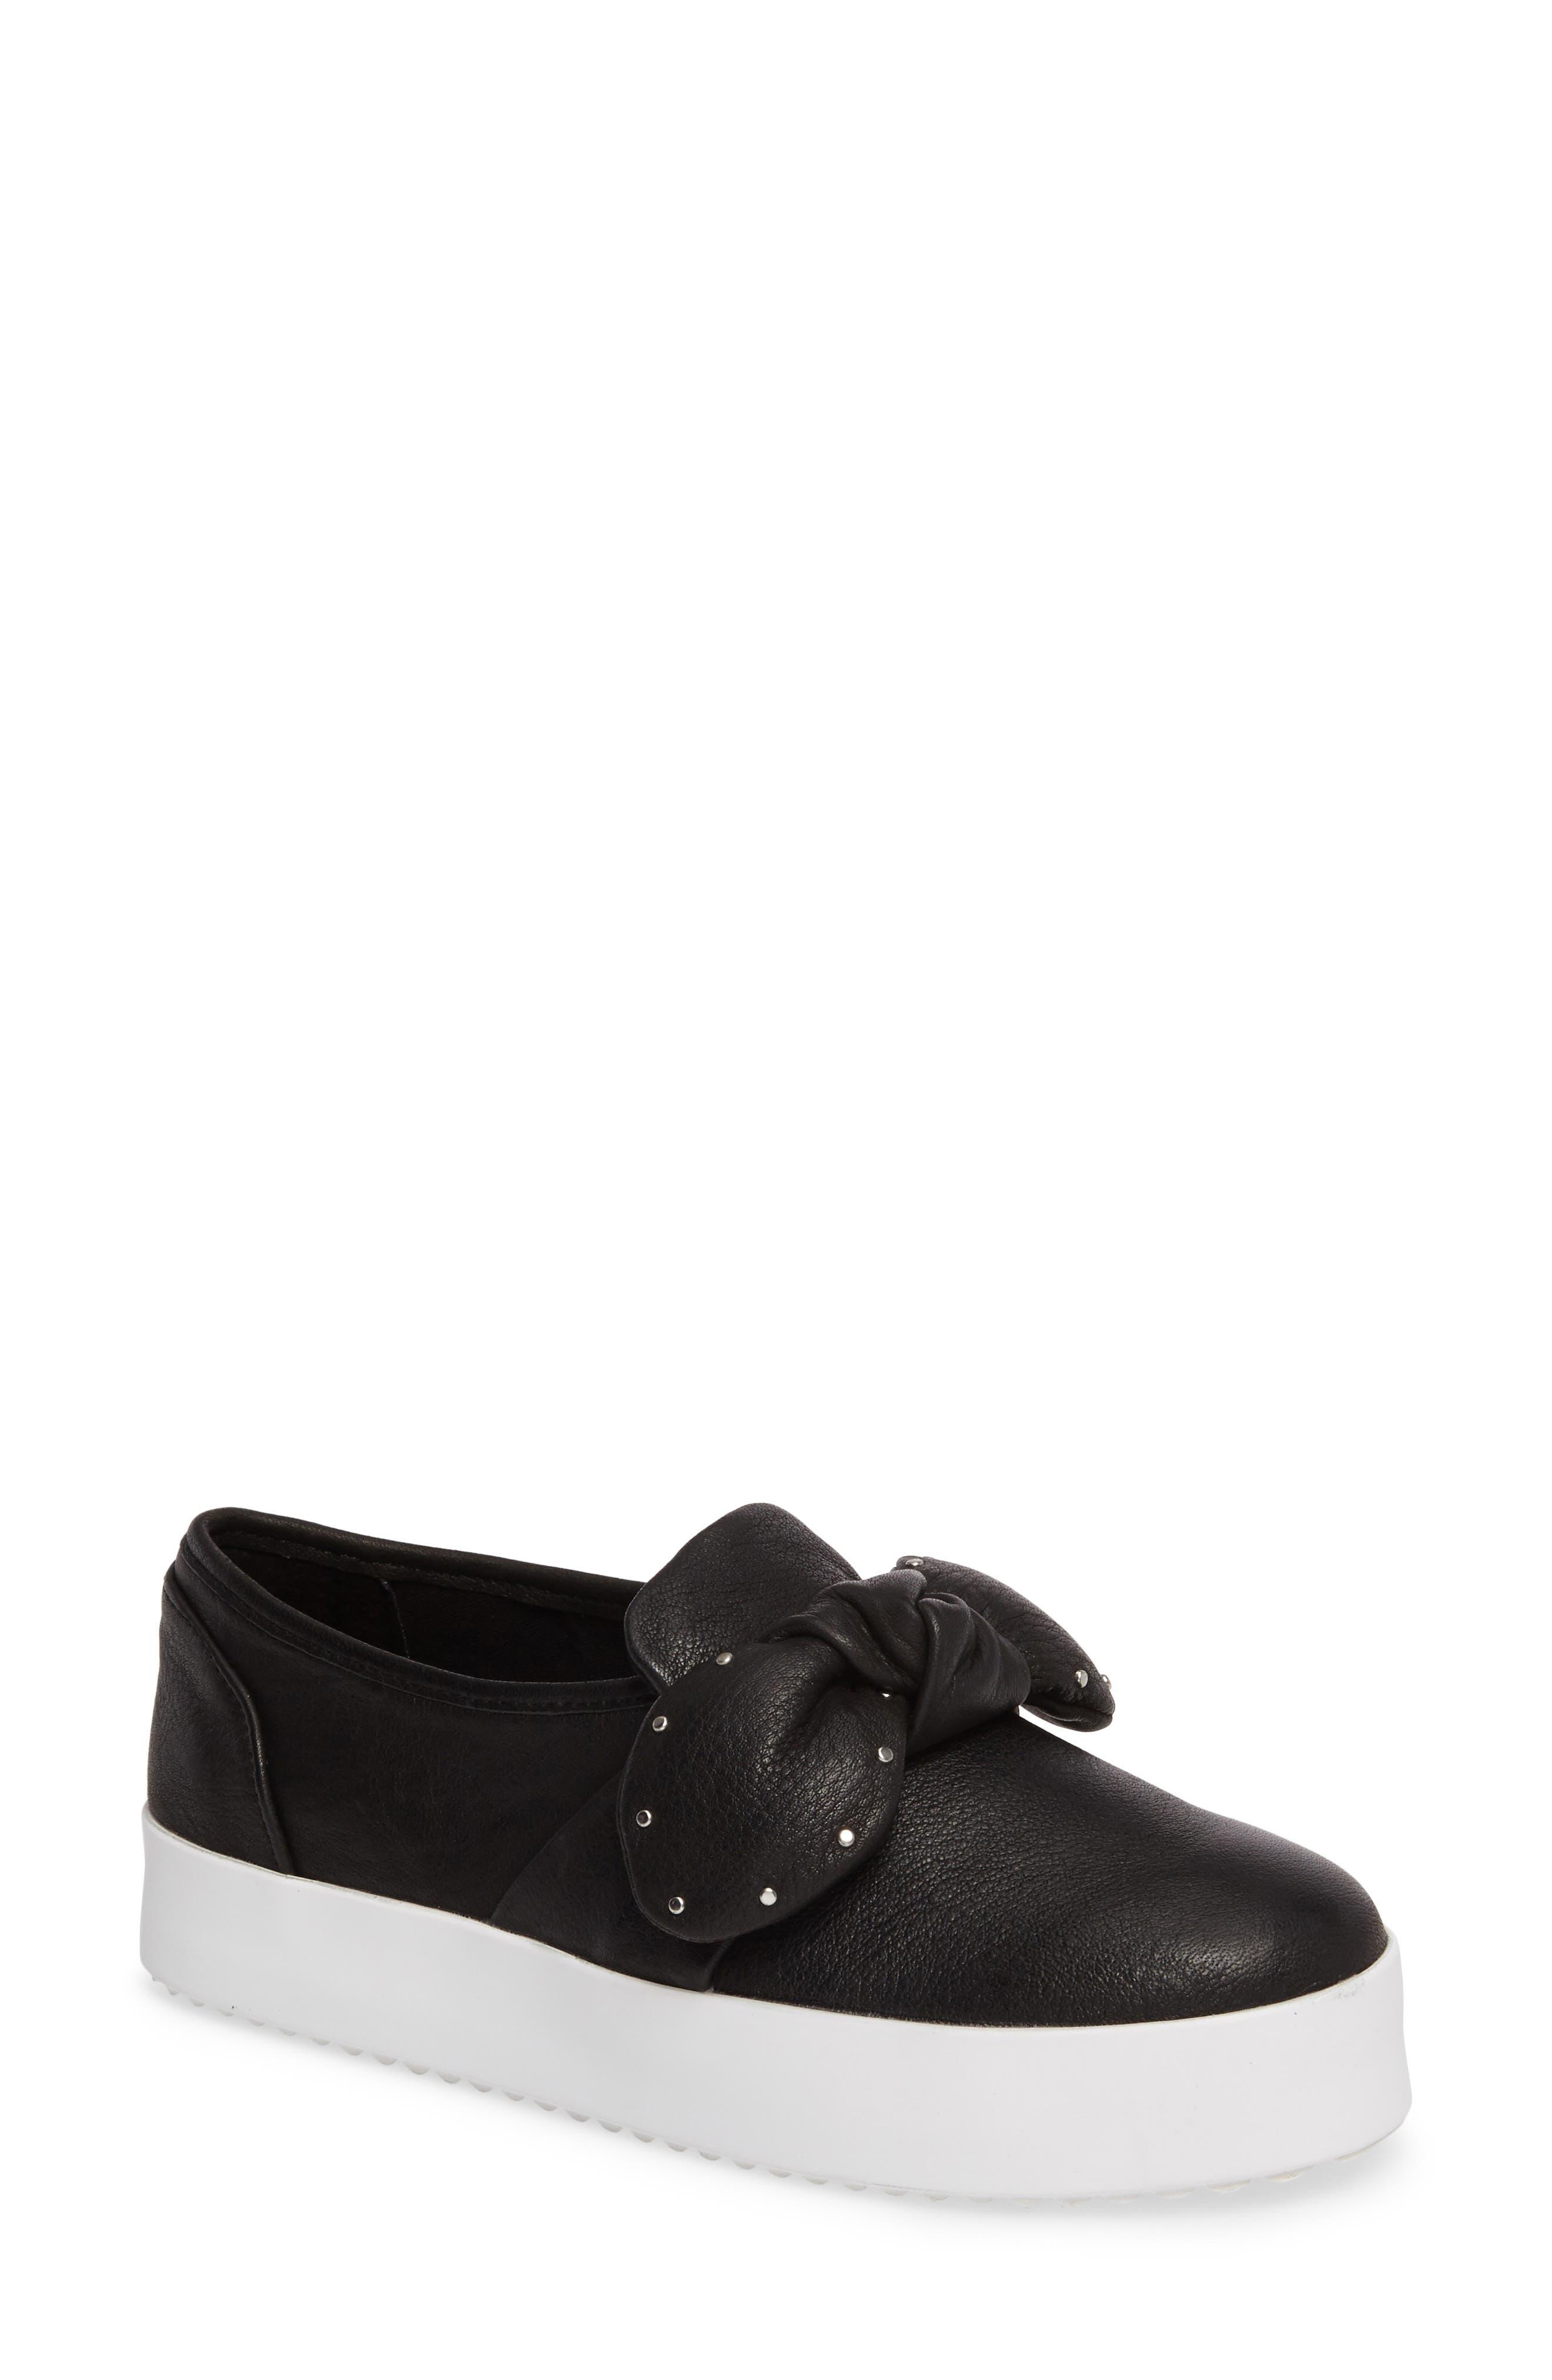 Stacey Studded Platform Slip-On,                             Main thumbnail 1, color,                             Black Leather